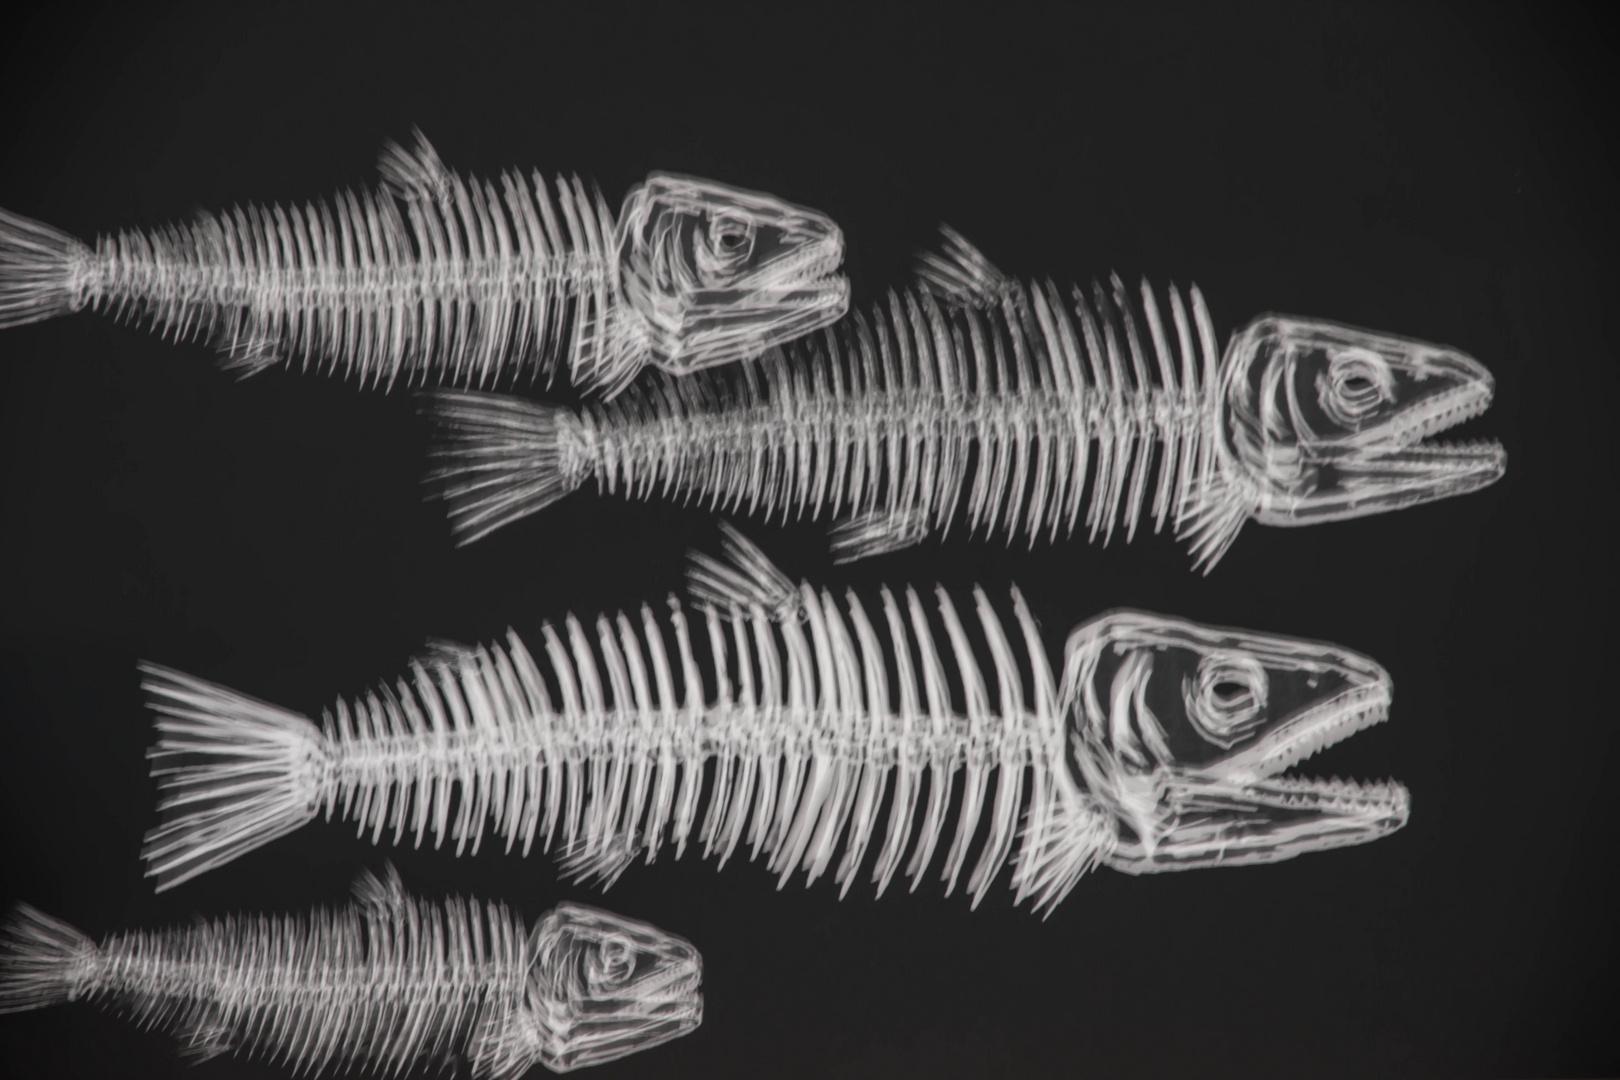 Shiverfish